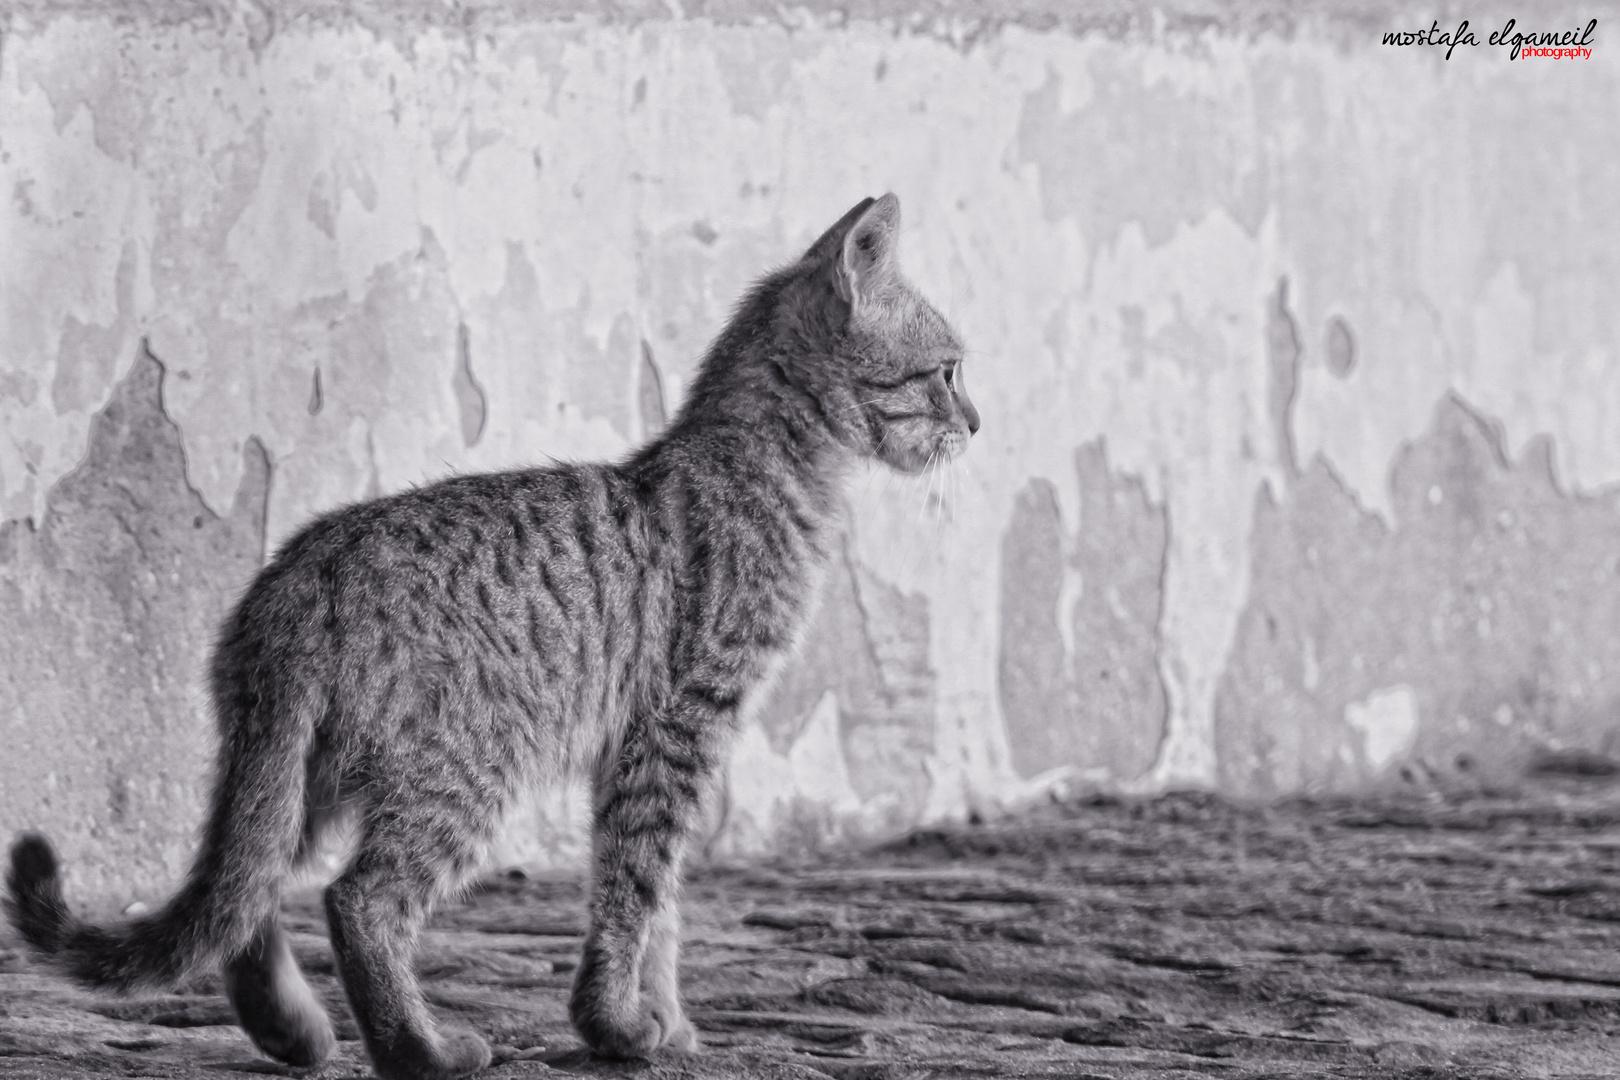 lonly cat